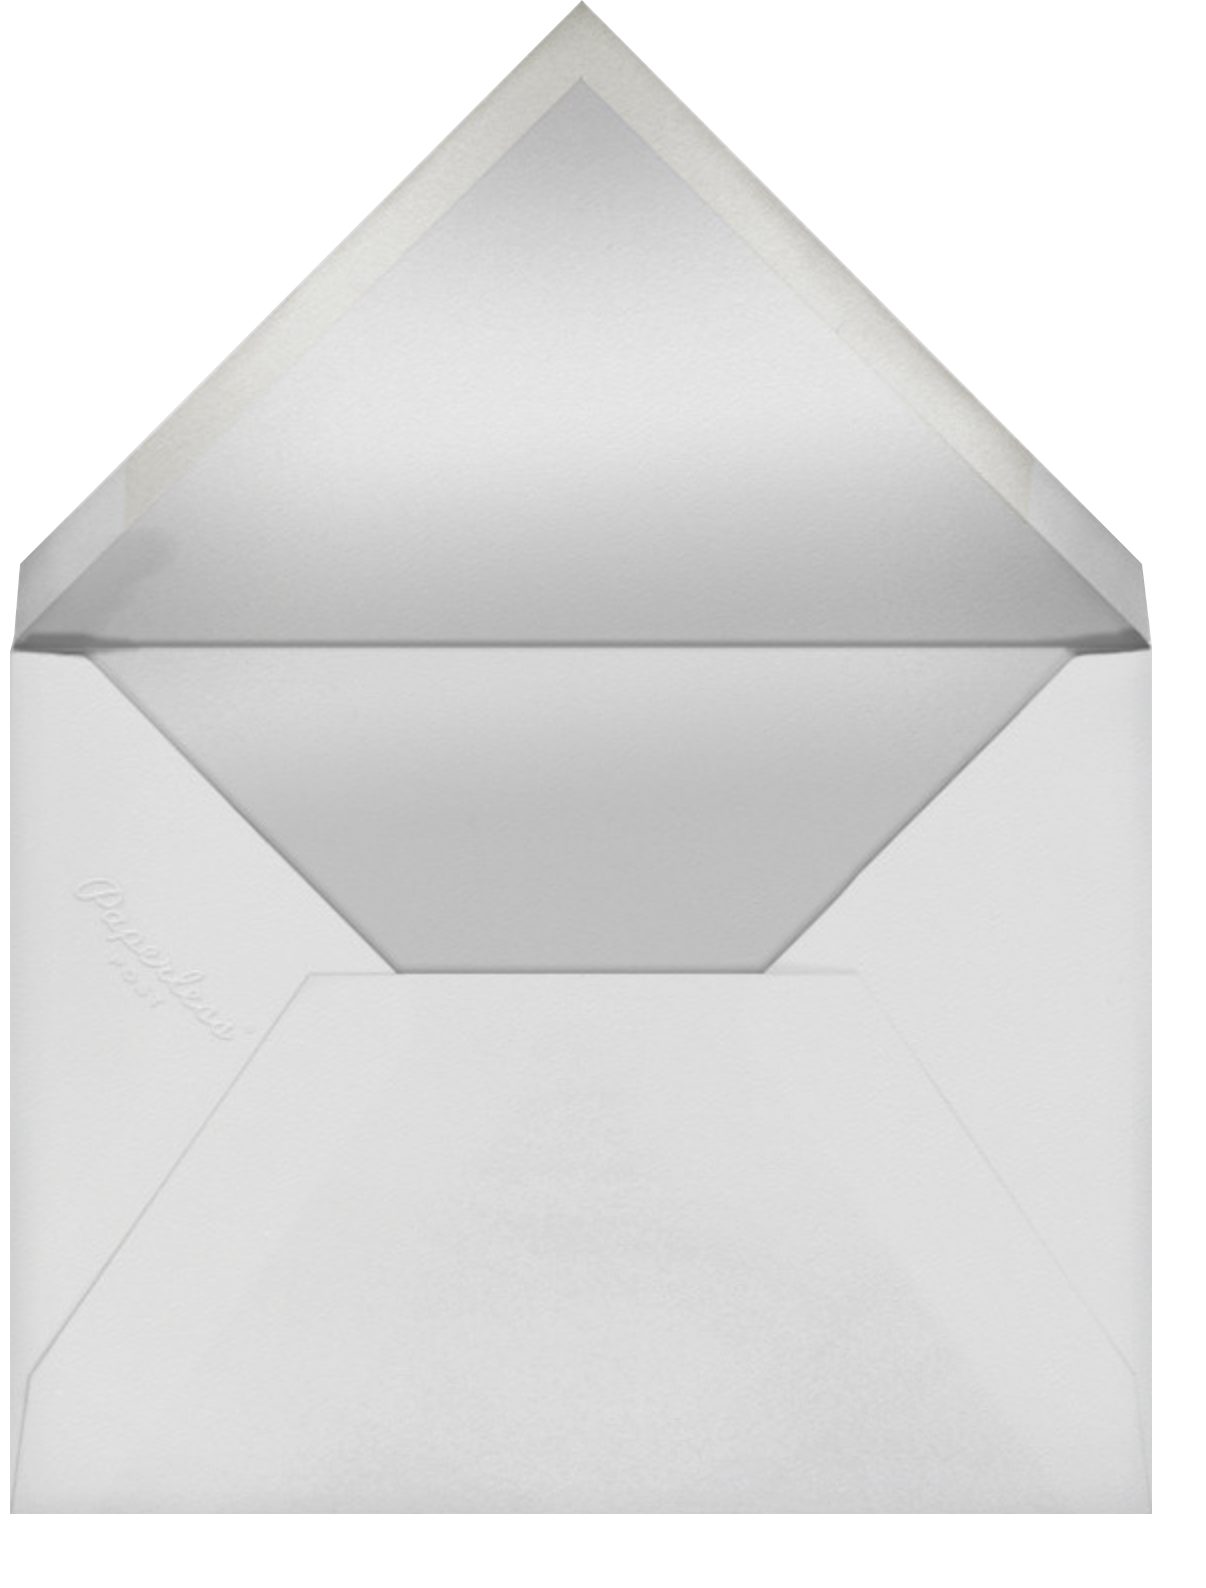 Baby Toque - Blossom - Paperless Post - Baby shower - envelope back